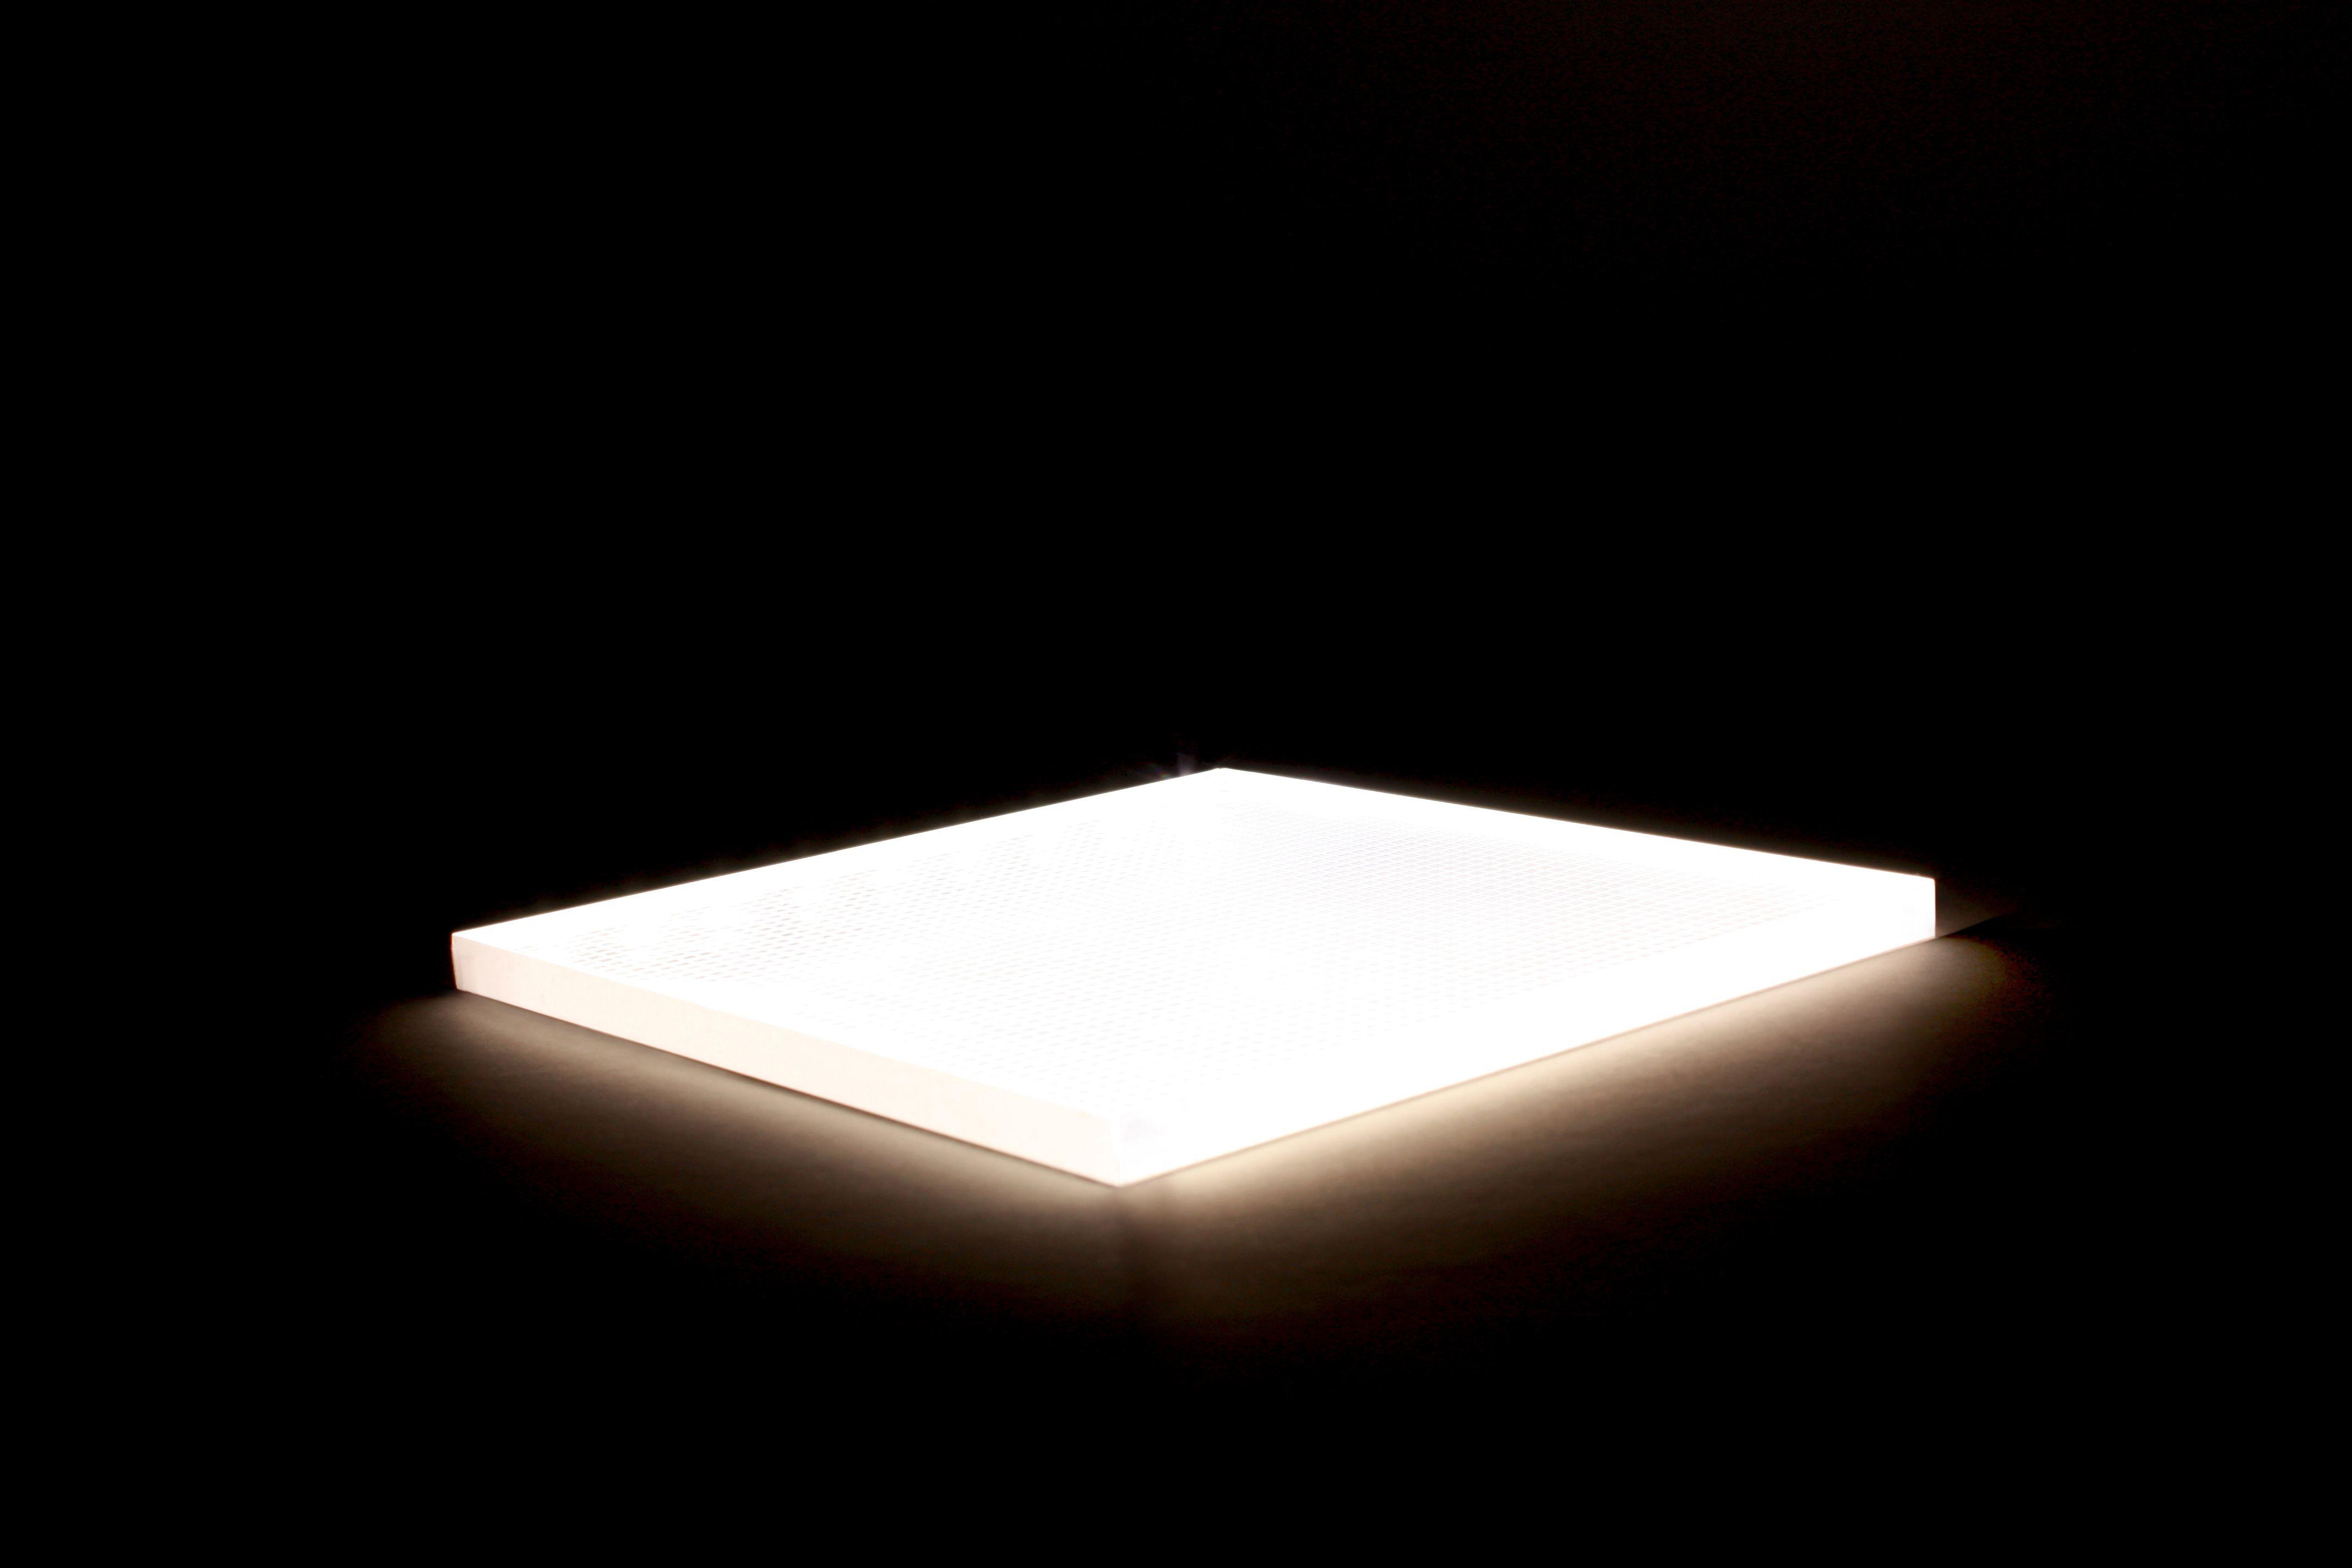 Led Light Sheet By Applelec Retail Lighting Design Ceiling Lights Led Ceiling